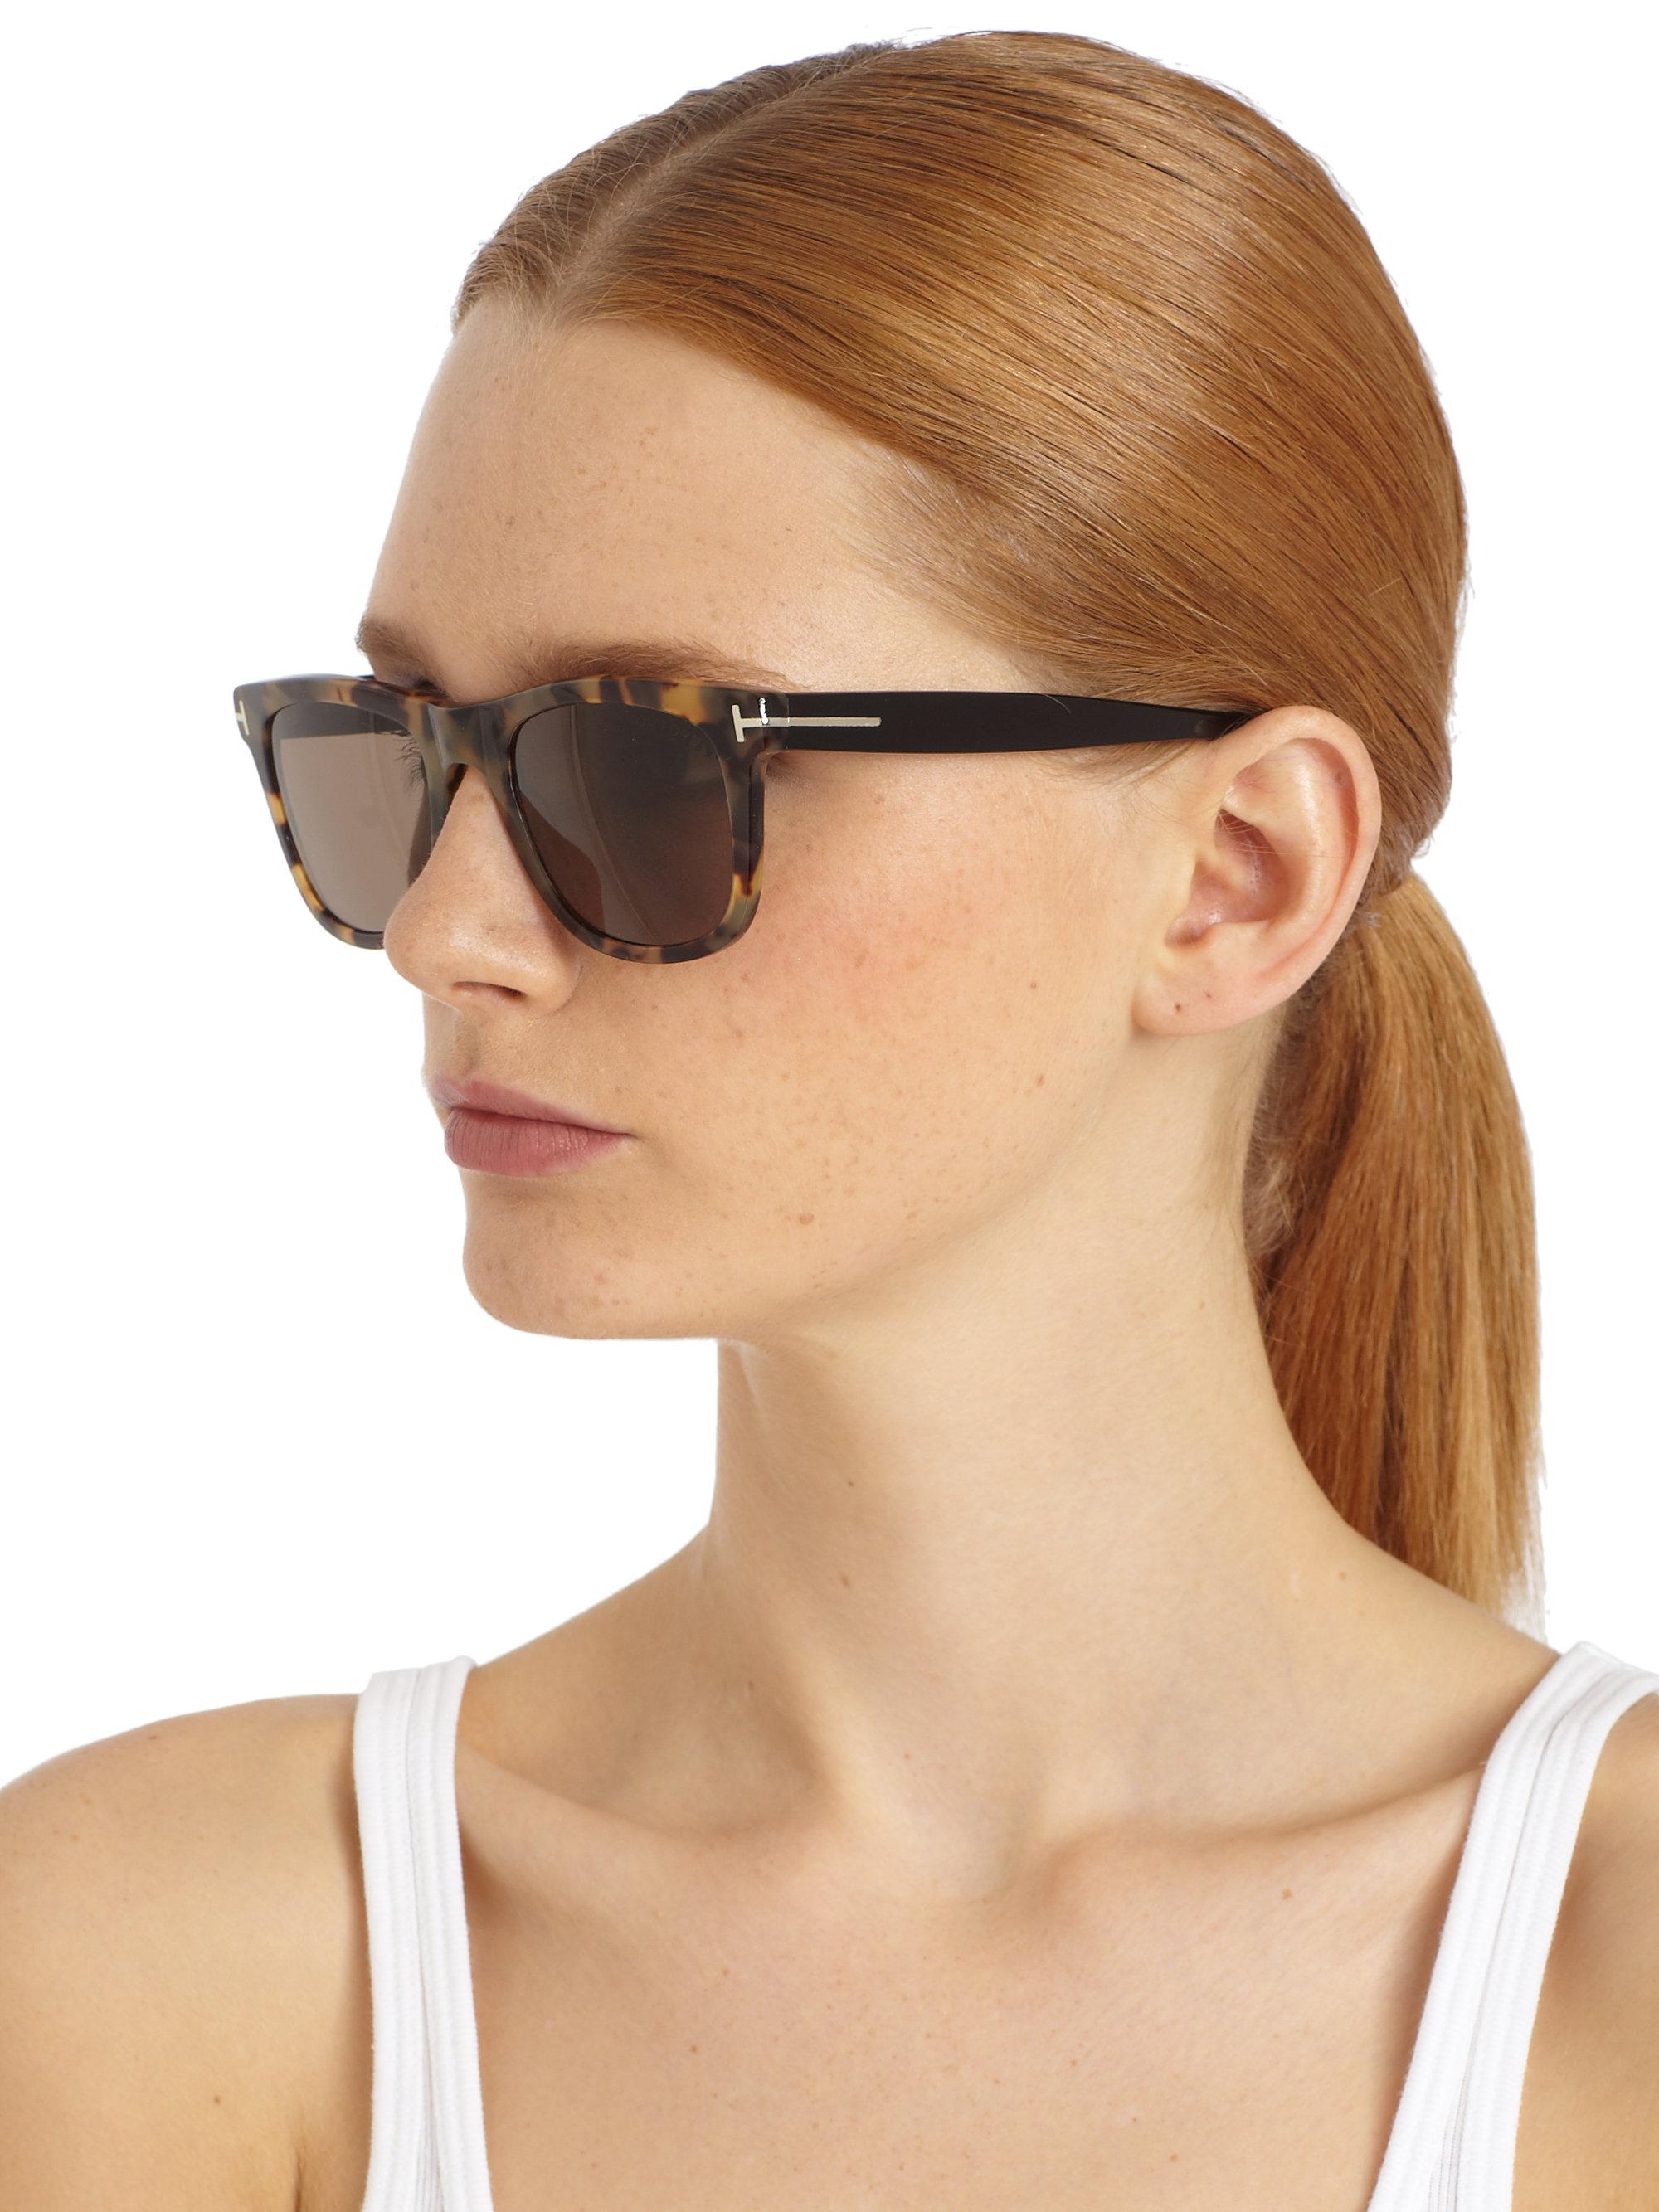 Gallery  sc 1 st  Lyst & Tom ford Leo Oversized Square Sunglasses | Lyst markmcfarlin.com